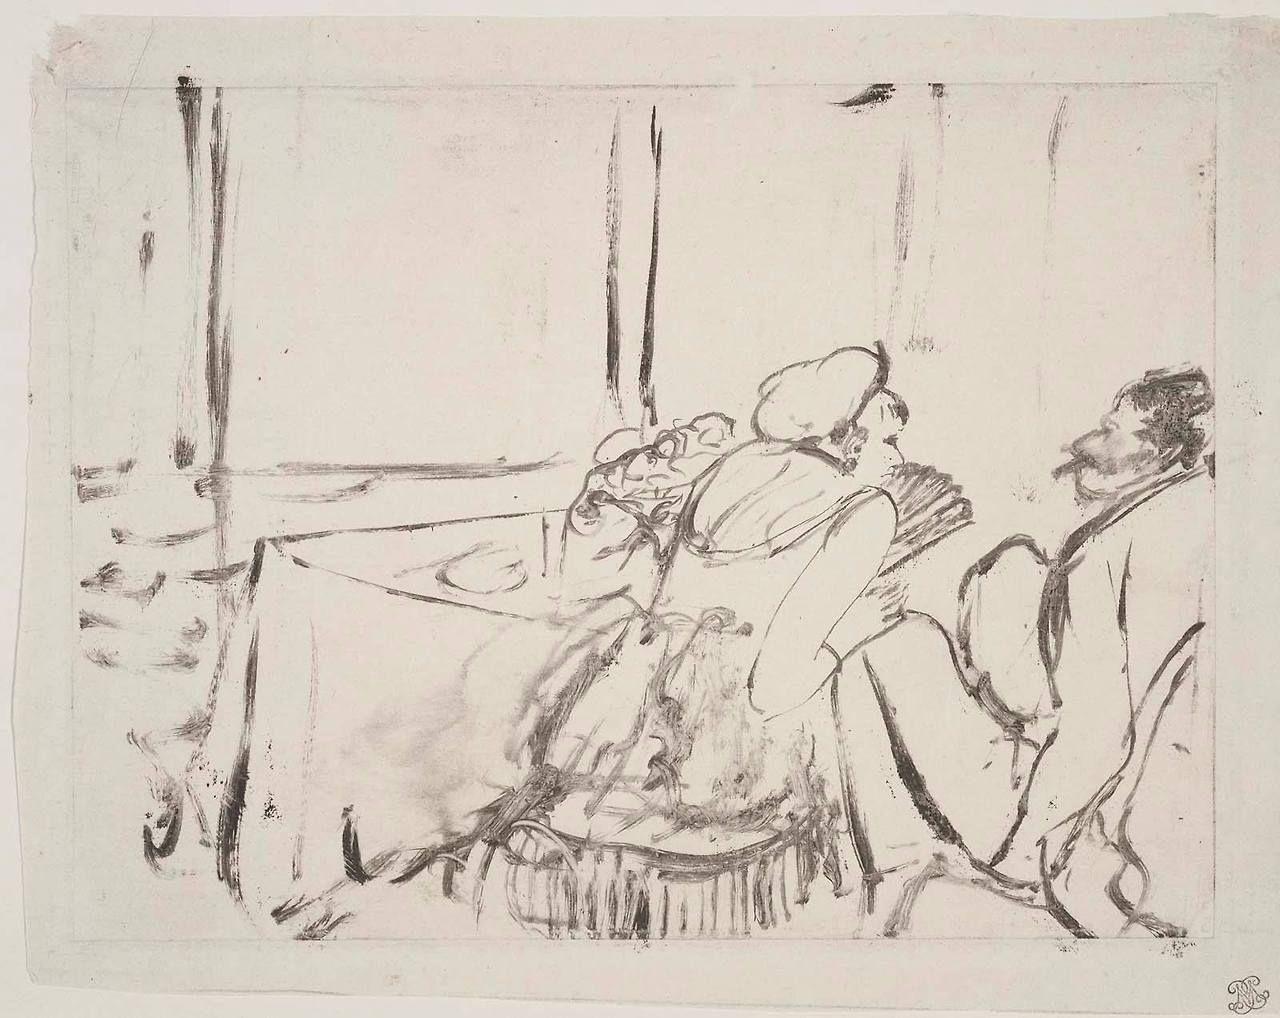 DEGAS, The Private Dining Room 1877u201379, MFA, Monotype